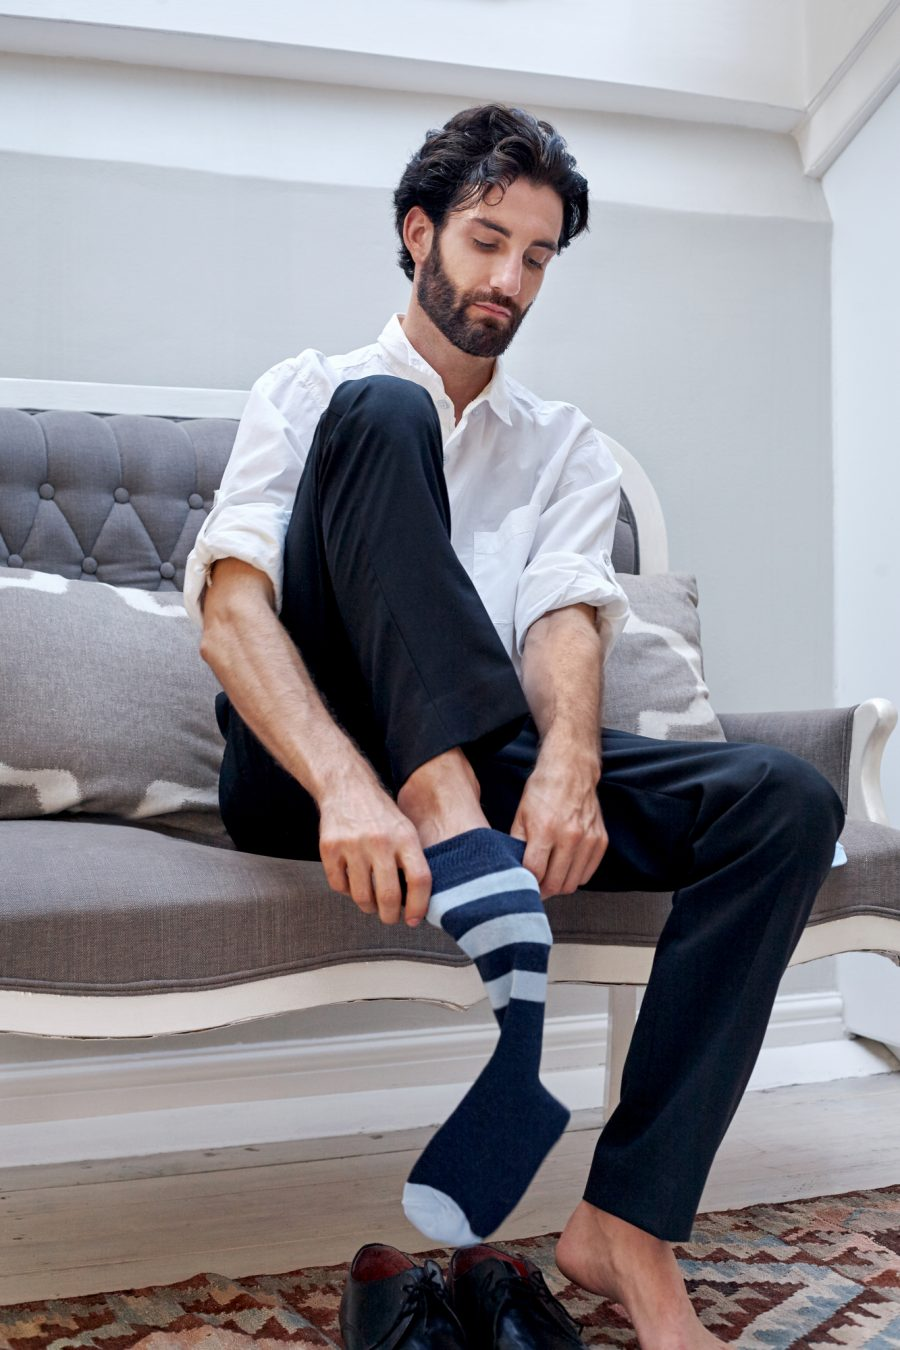 Stylish Man Striped Socks